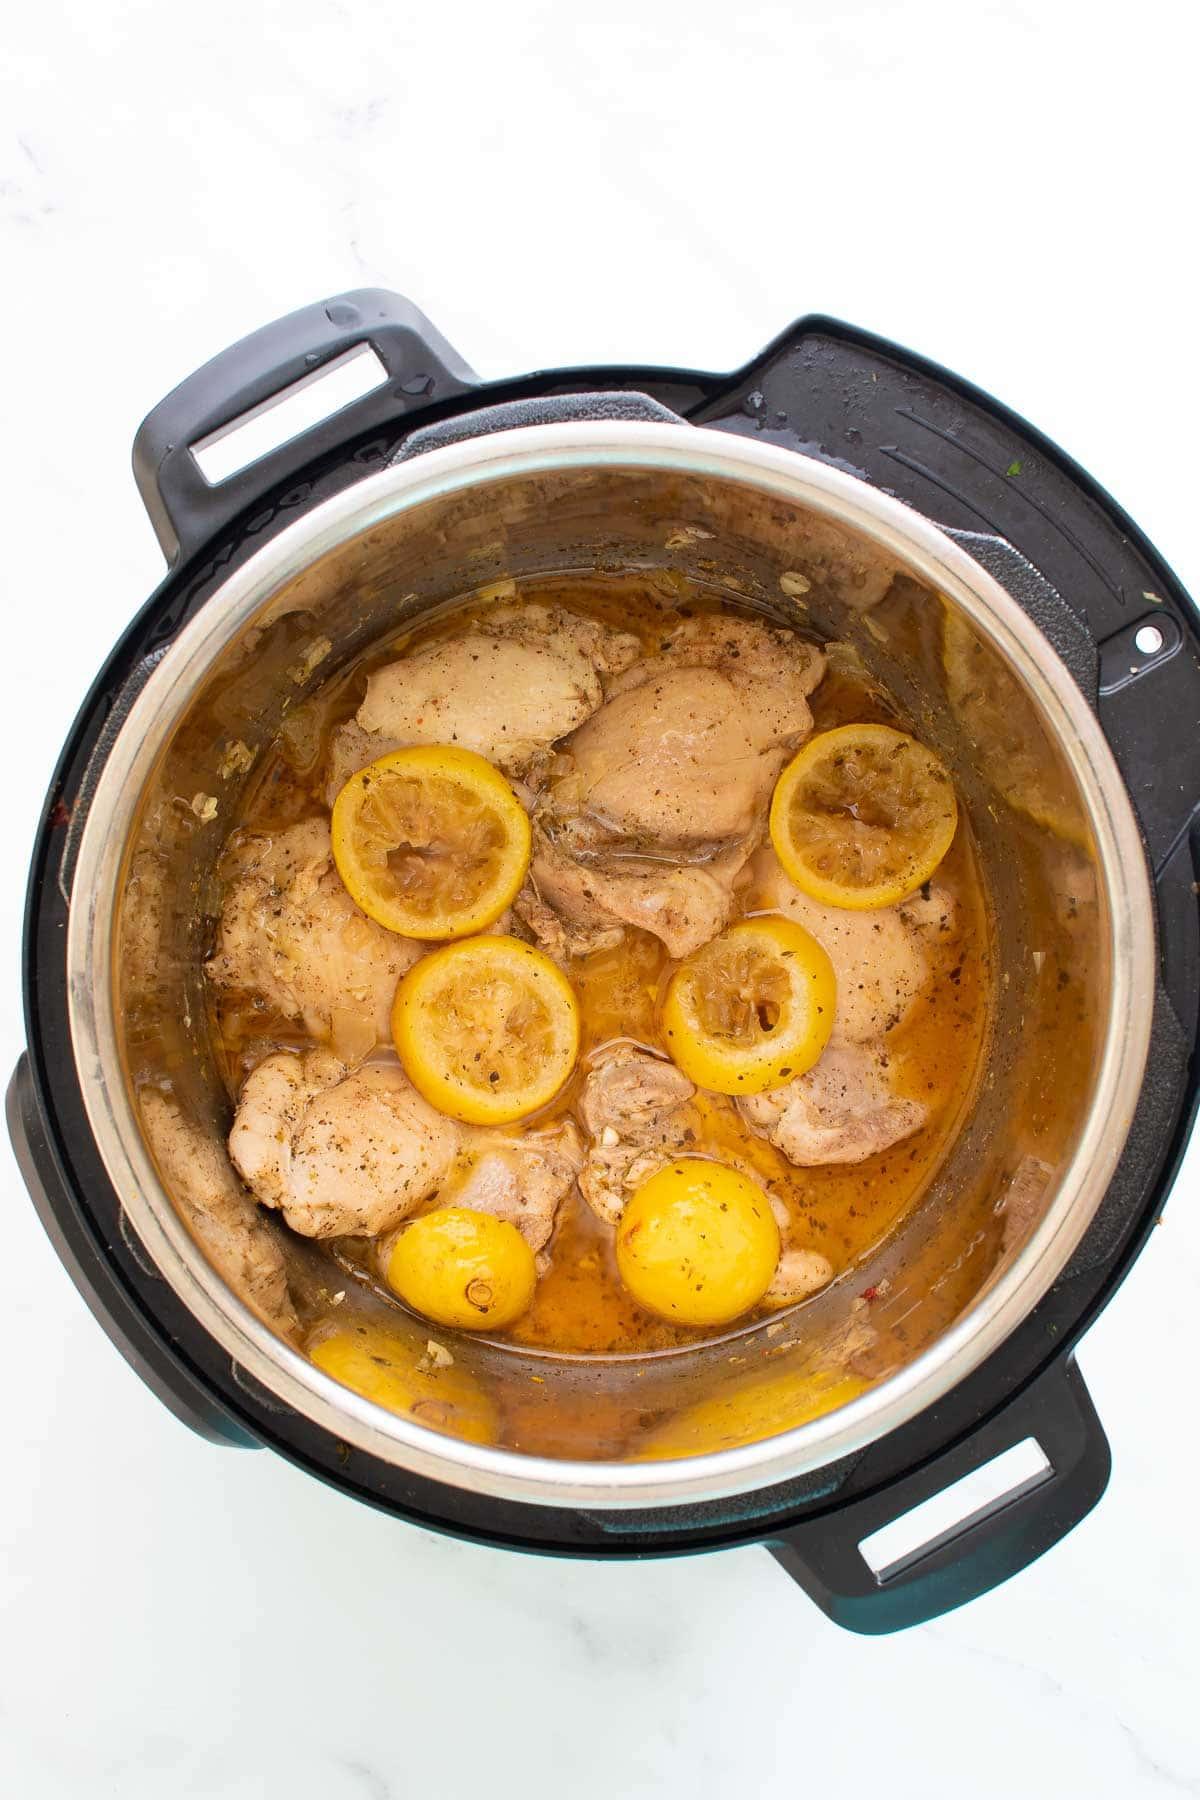 Lemon garlic chicken in an Instant Pot.